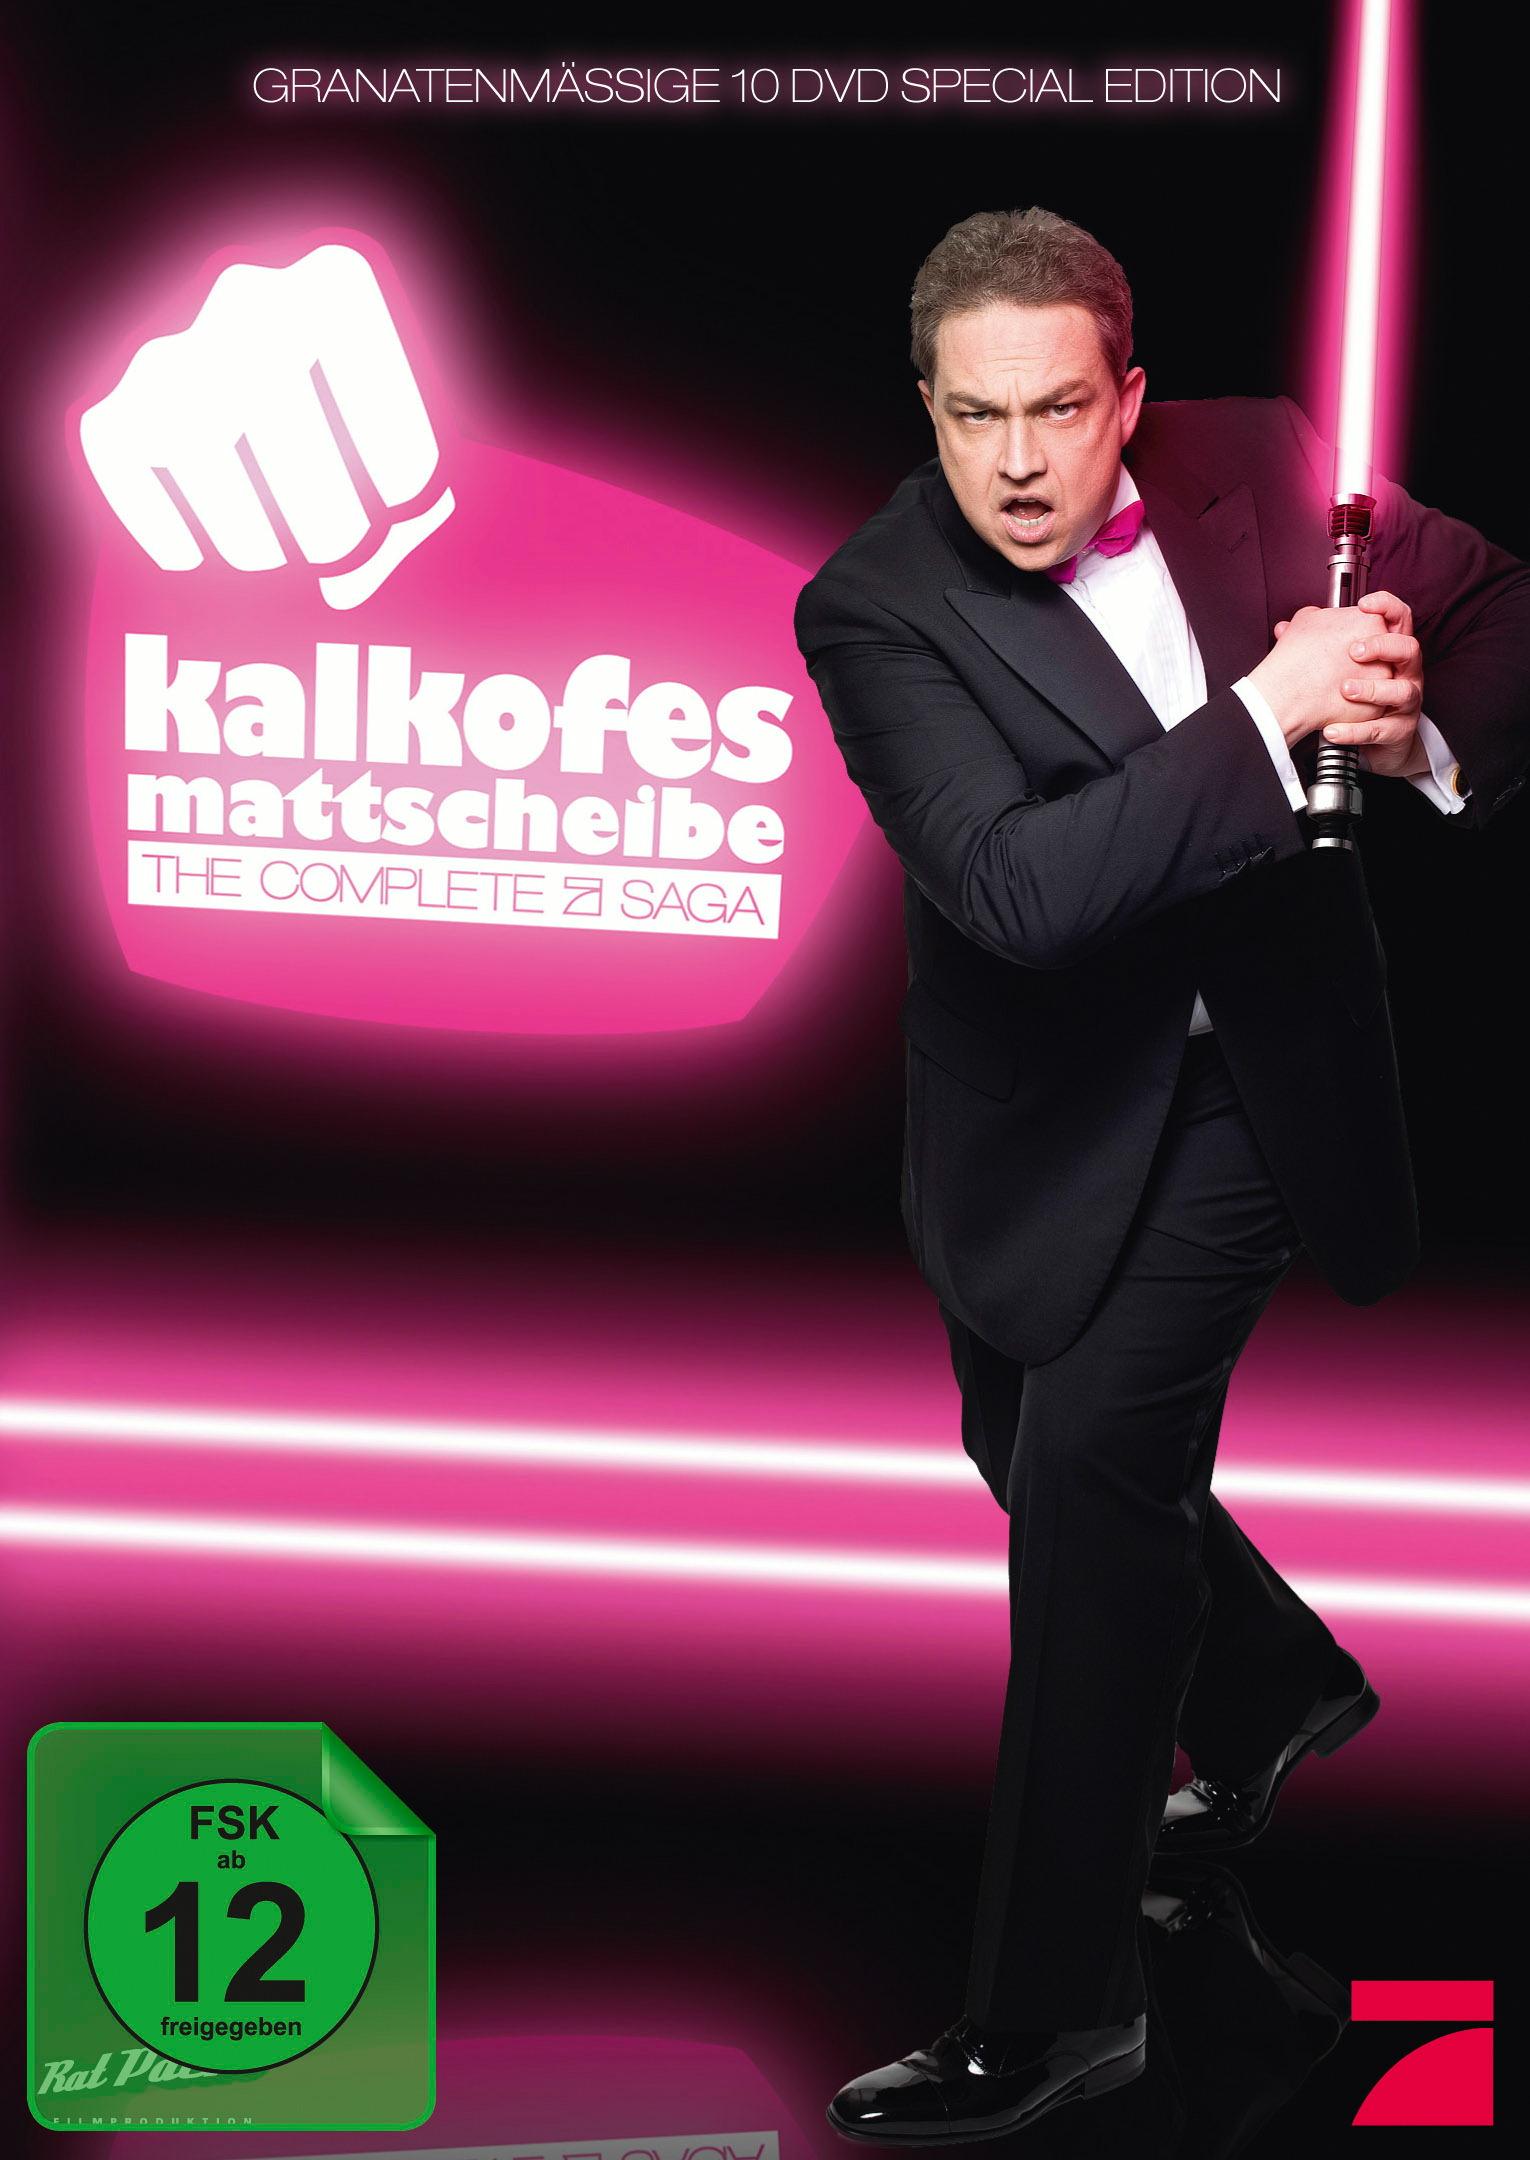 Kalkofes Mattscheibe - The Complete ProSieben-Saga (Special Edition, 10 Discs) Poster